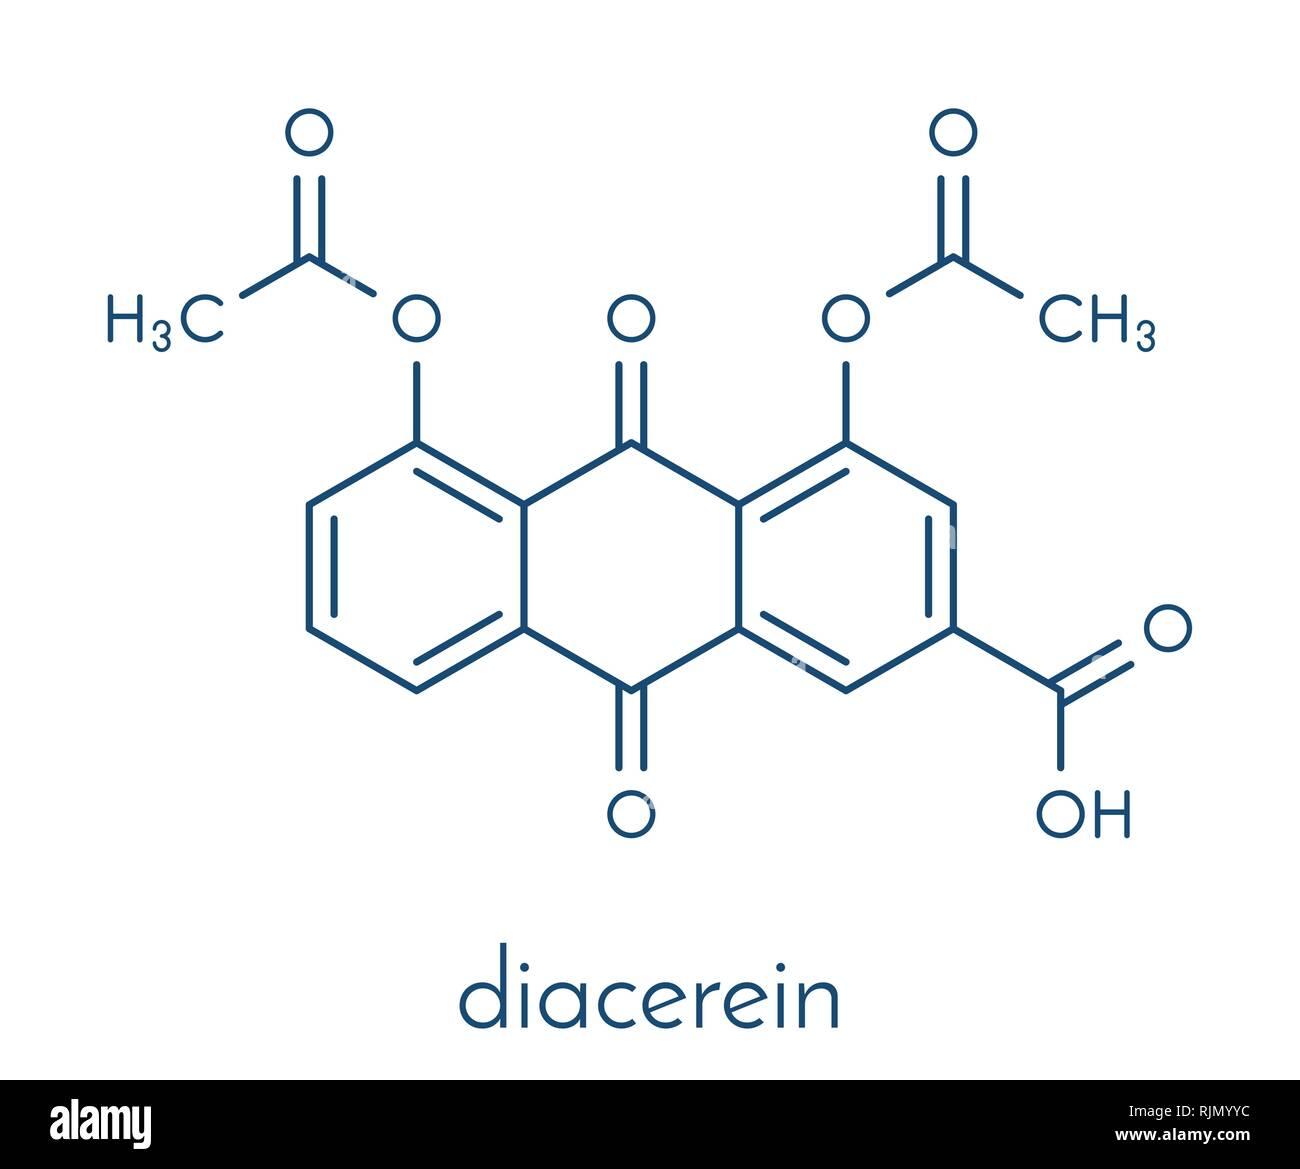 Diacerein drug molecule. Skeletal formula. - Stock Image